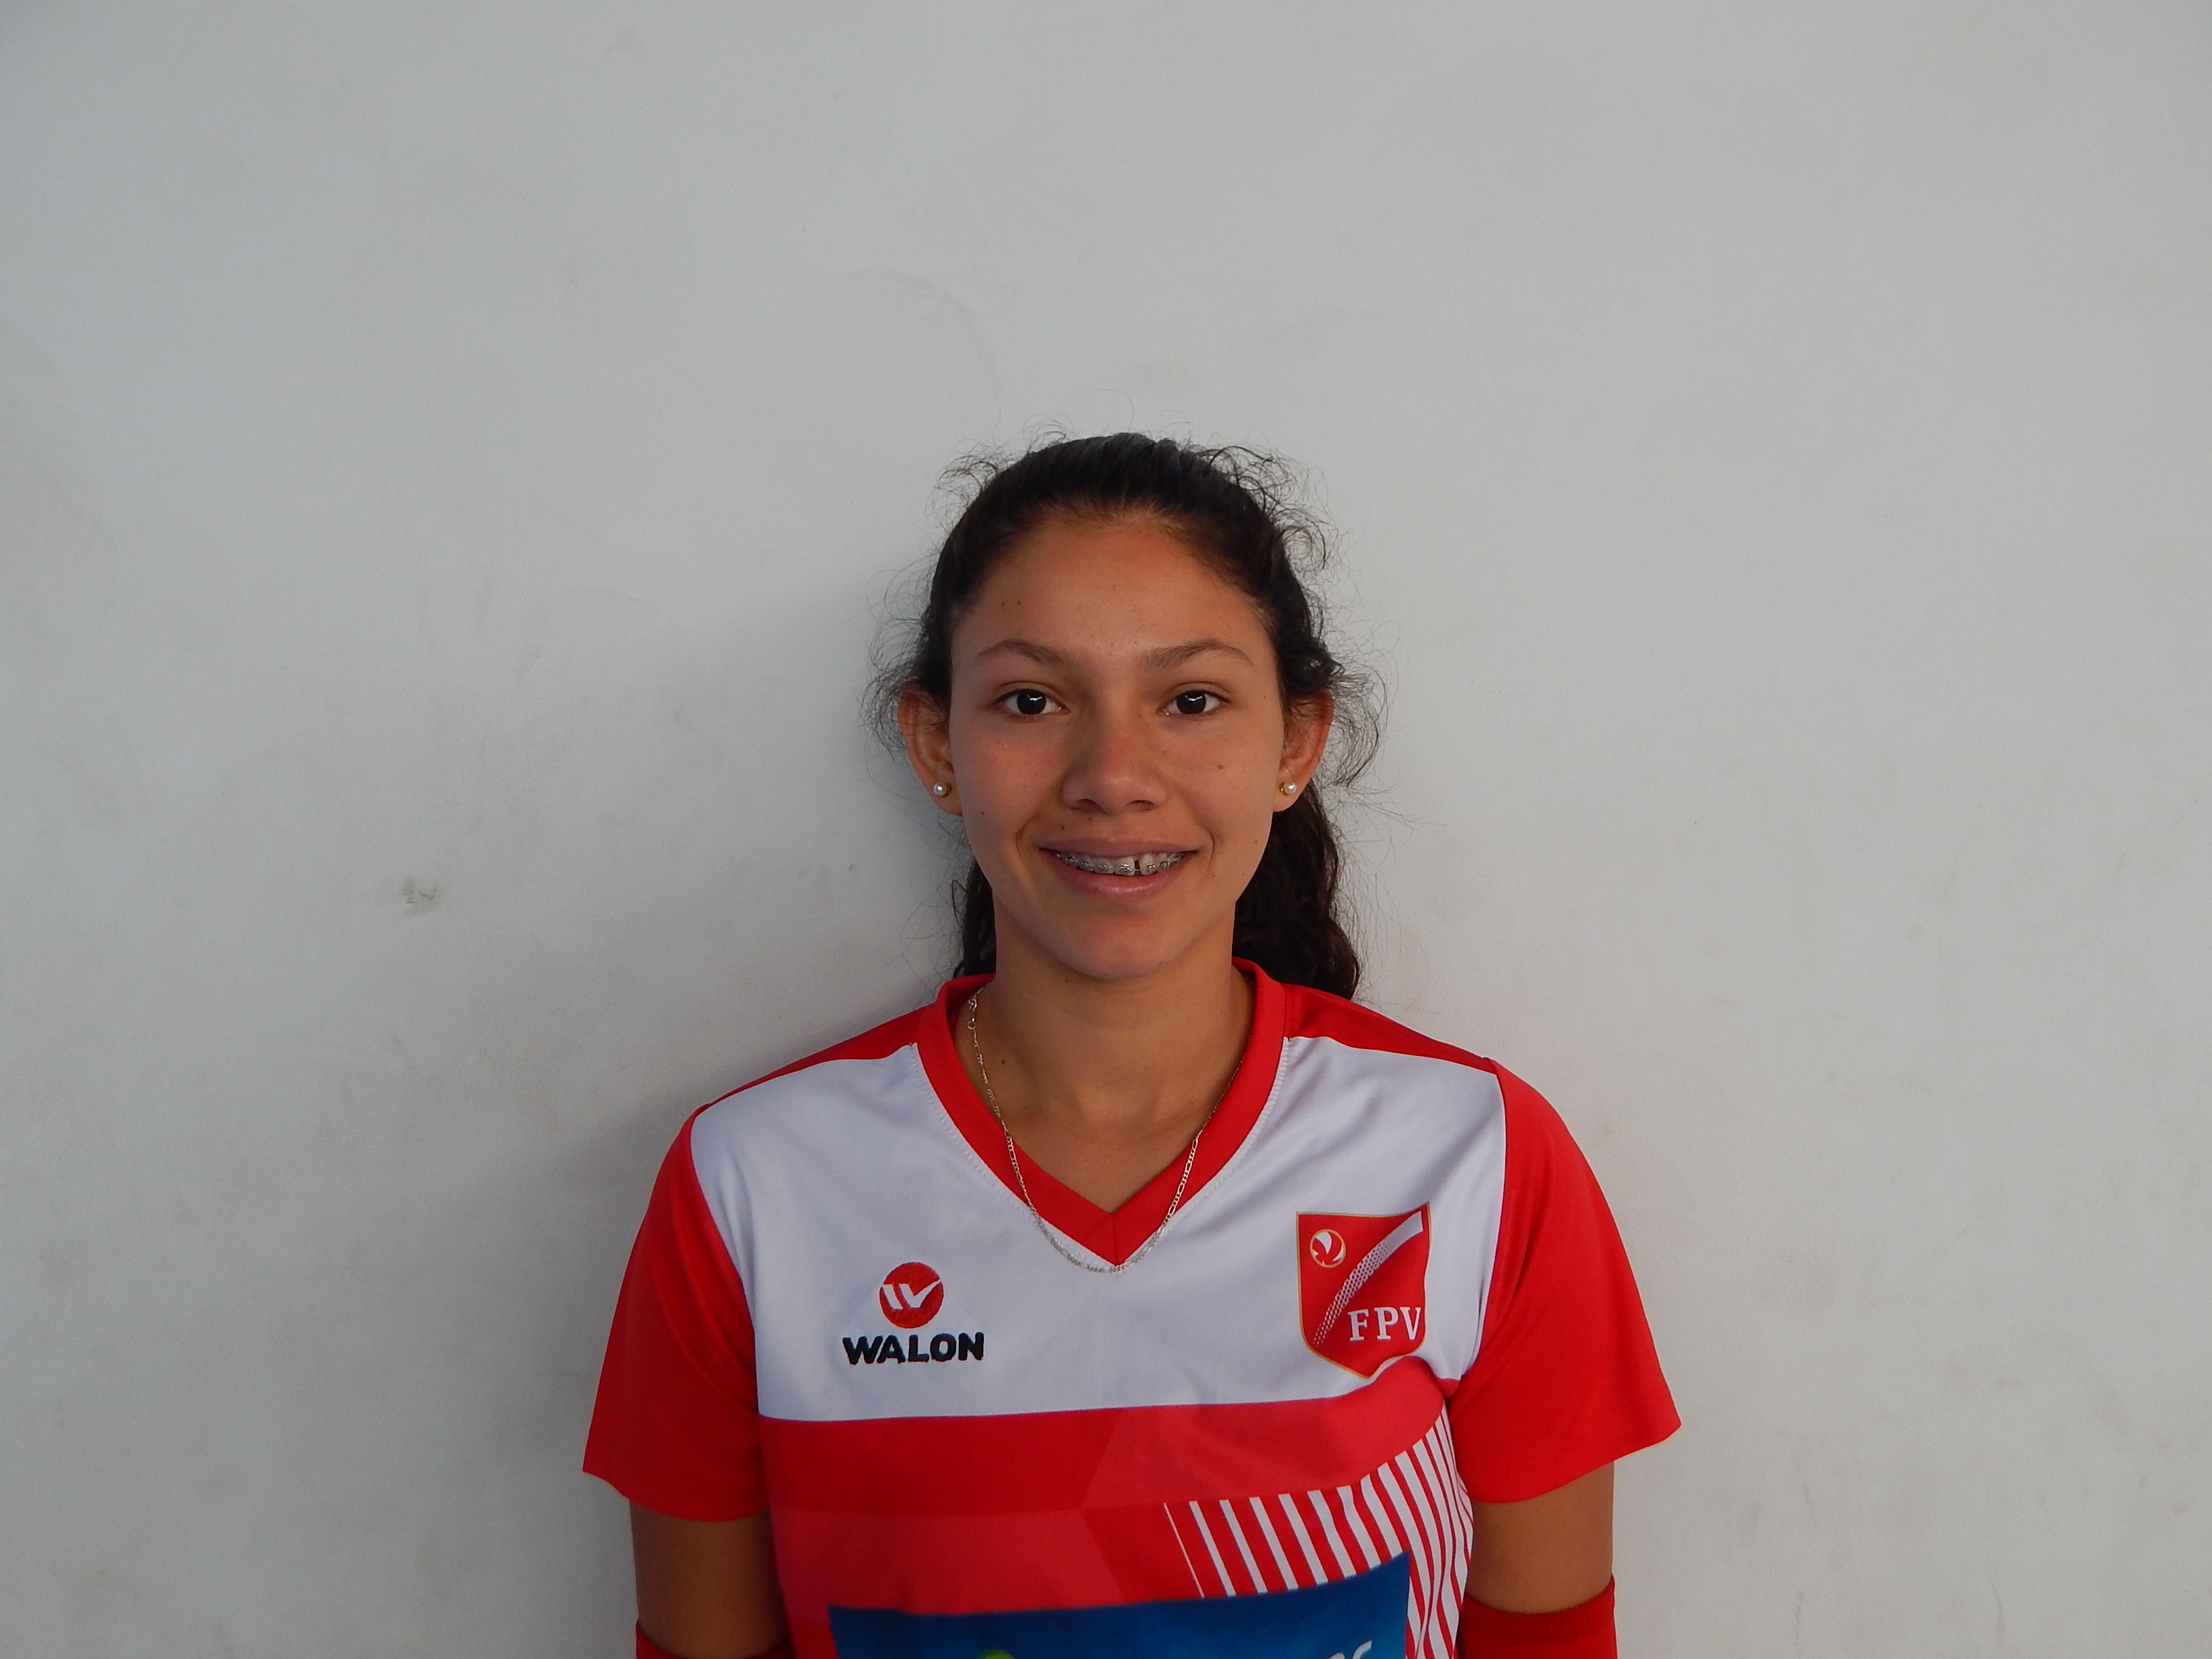 Yomira Villacorta